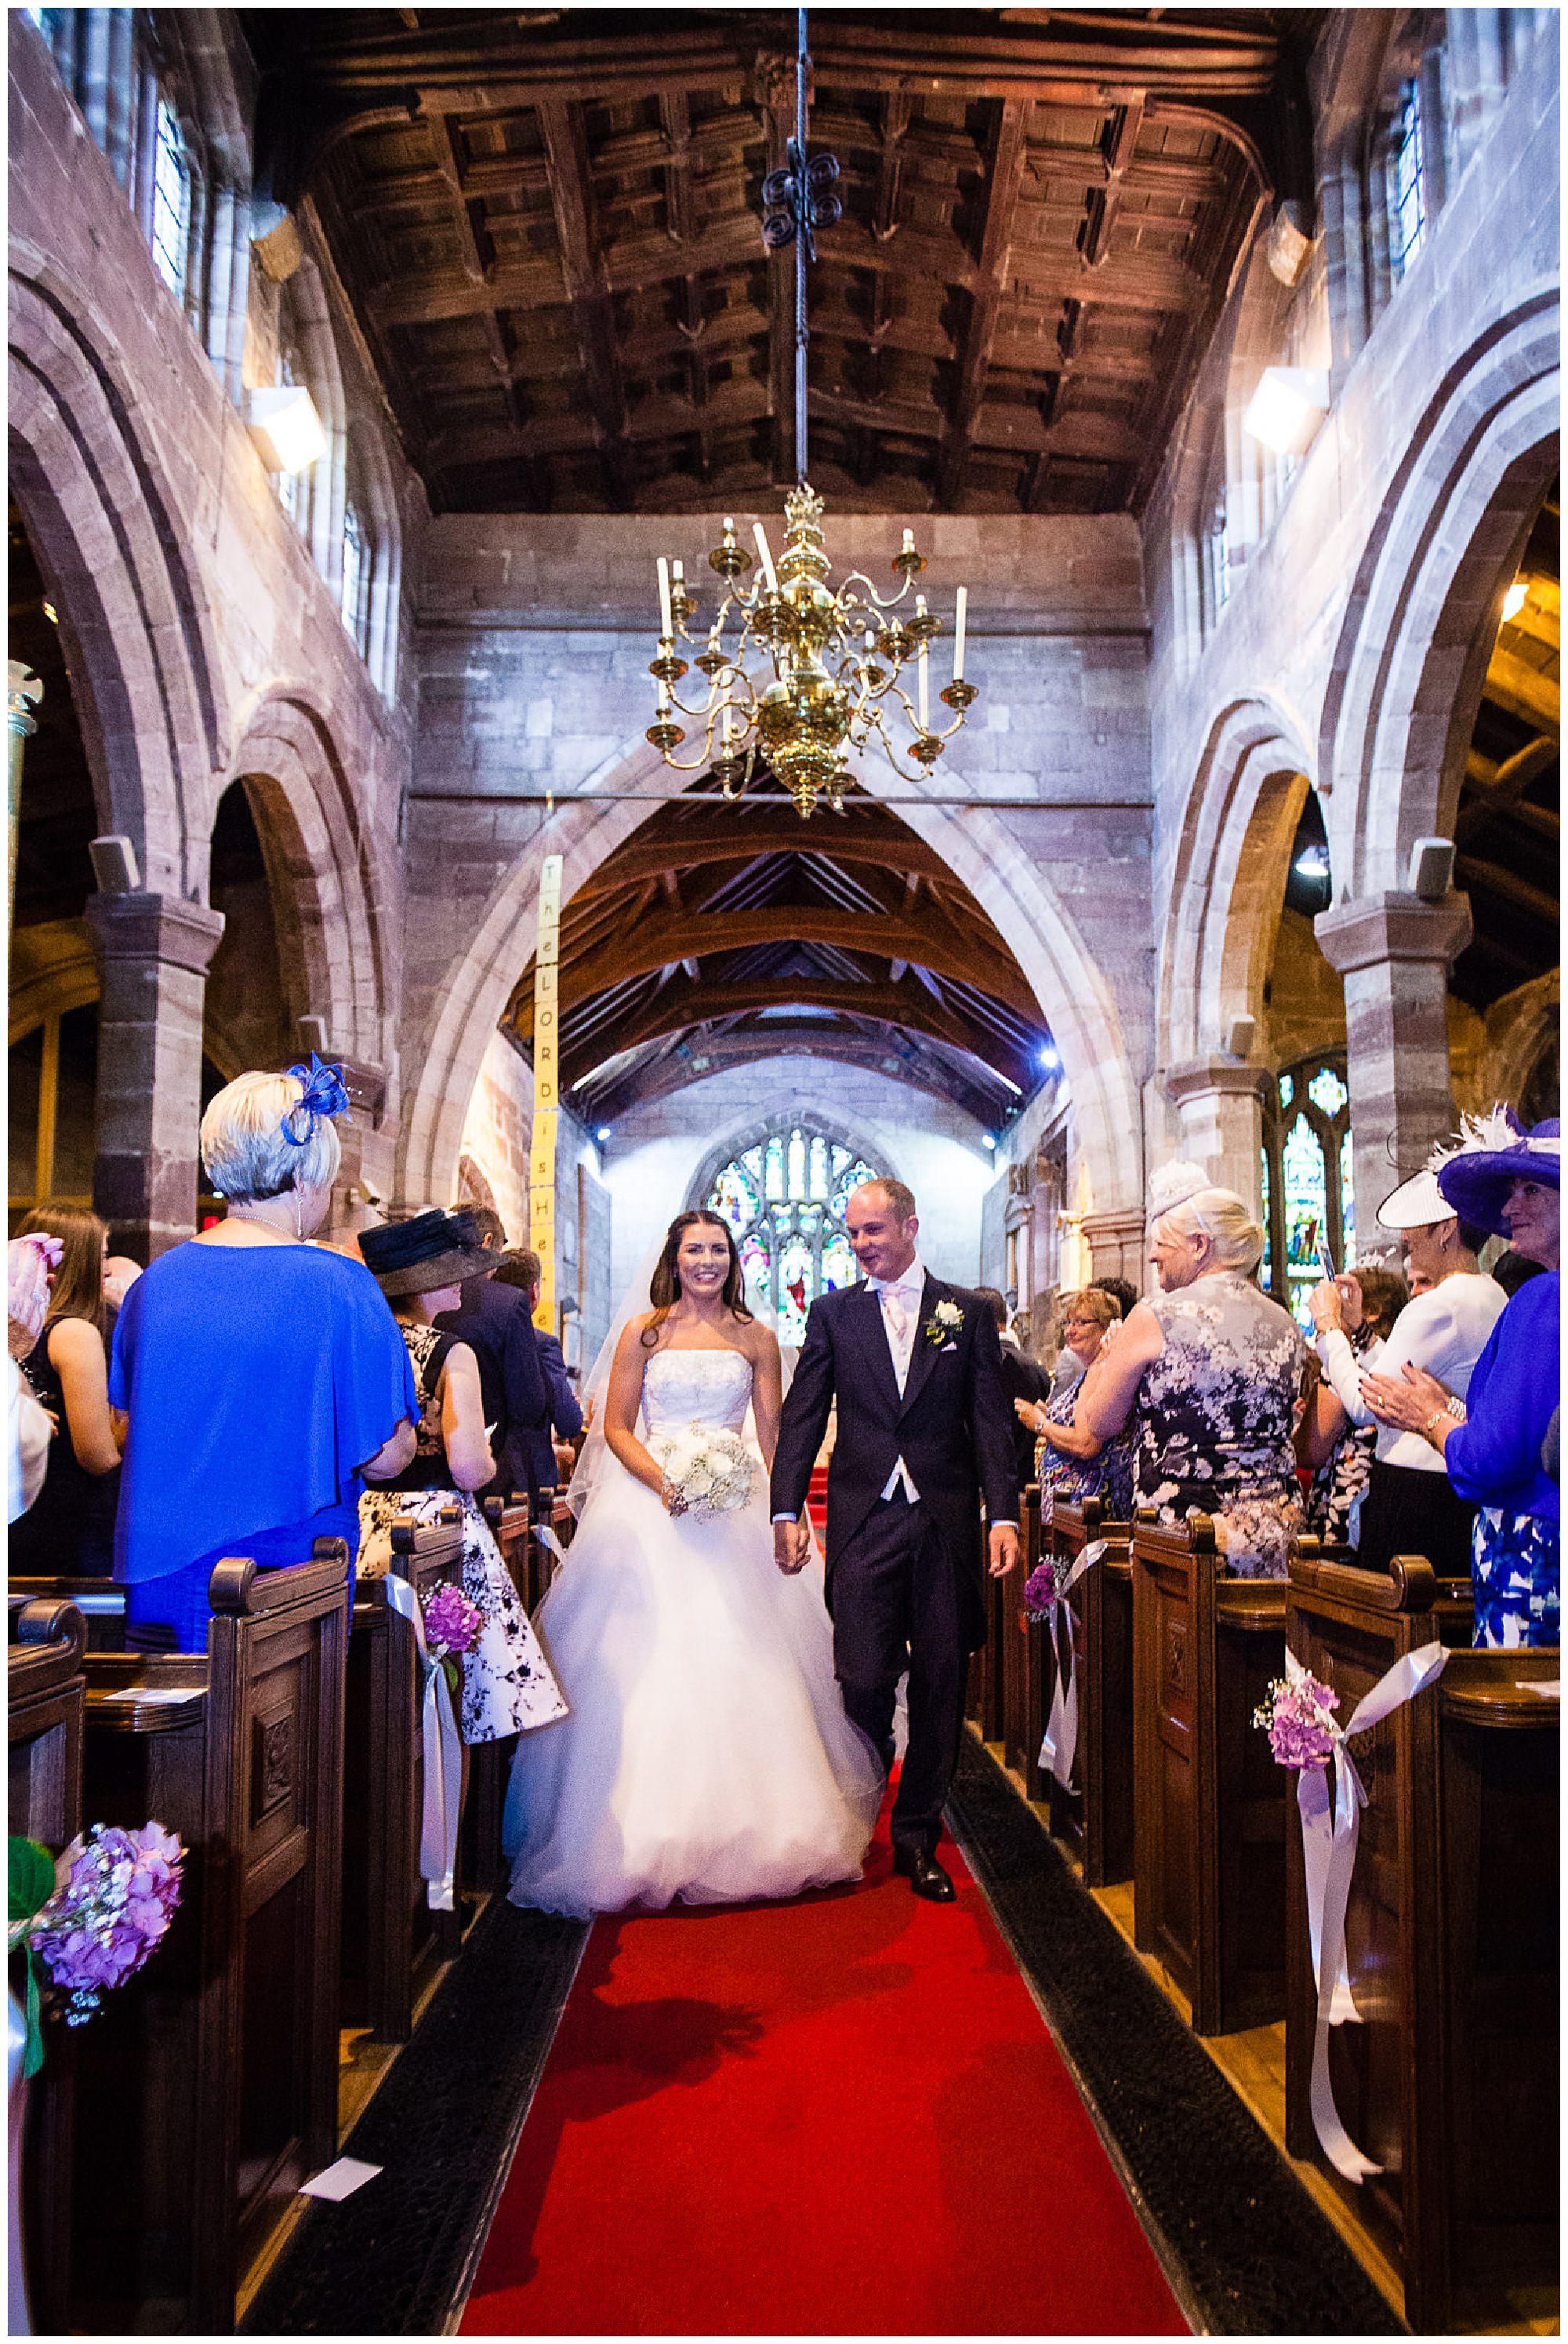 St. James' Church Audlem Wedding Photography - St. James' Church Audlem Wedding Photography